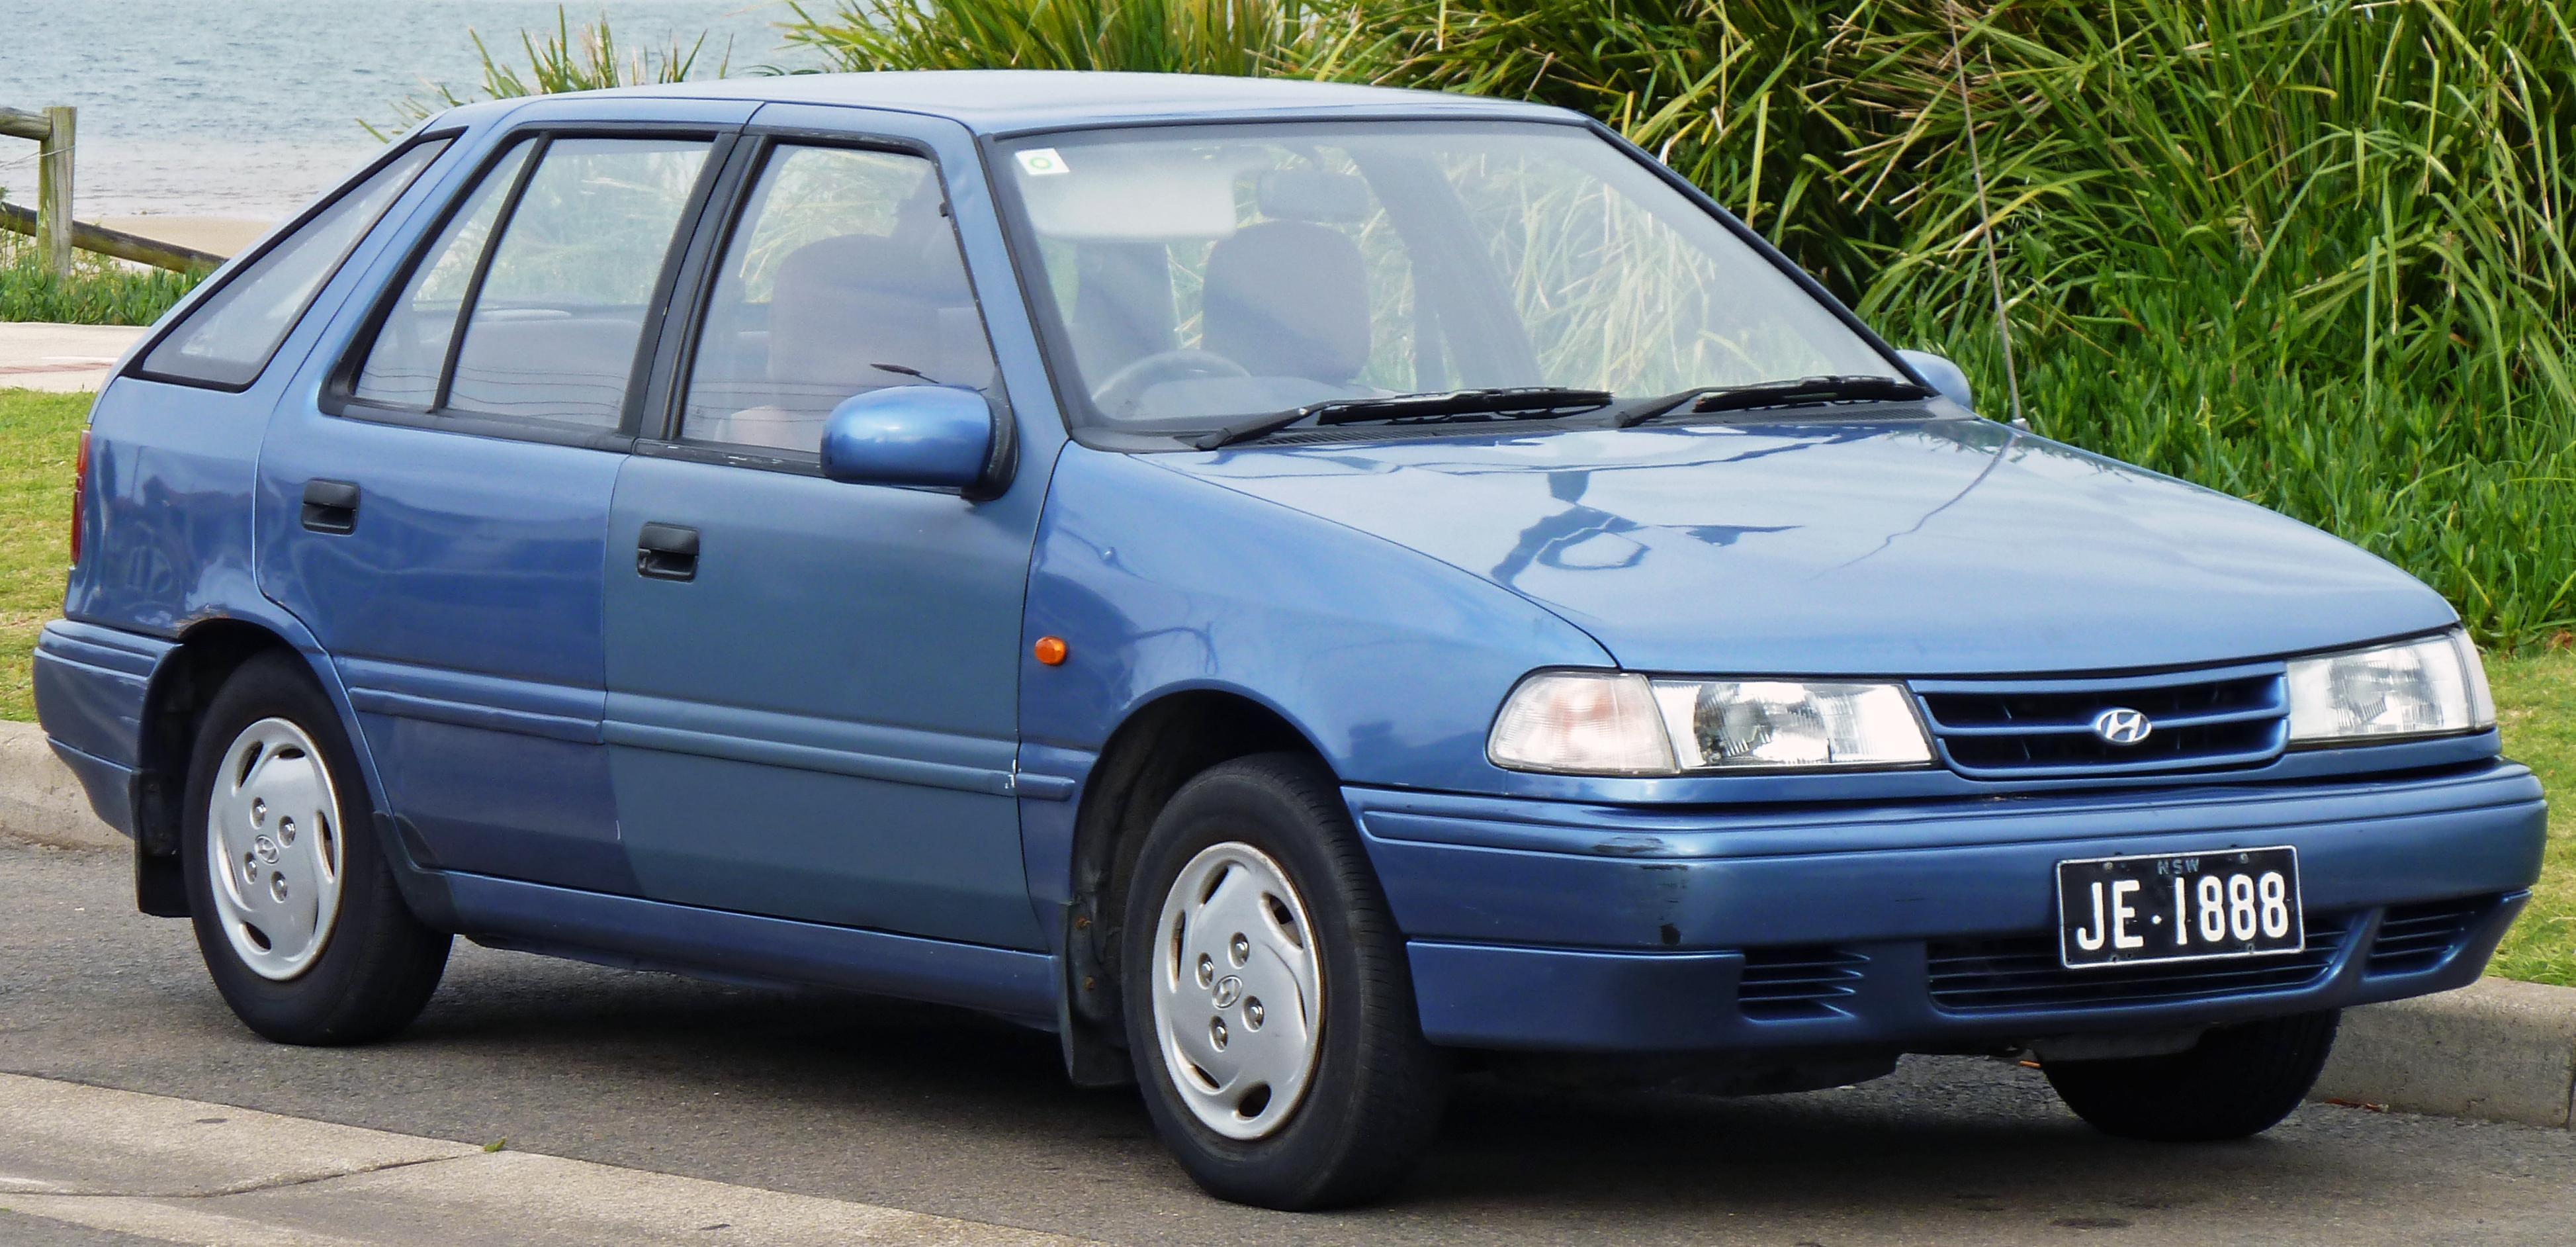 file 1991 1994 hyundai excel x2 ls 5 door hatchback 03 jpg rh commons wikimedia org 2016 Hyundai Accent 2008 Hyundai Accent